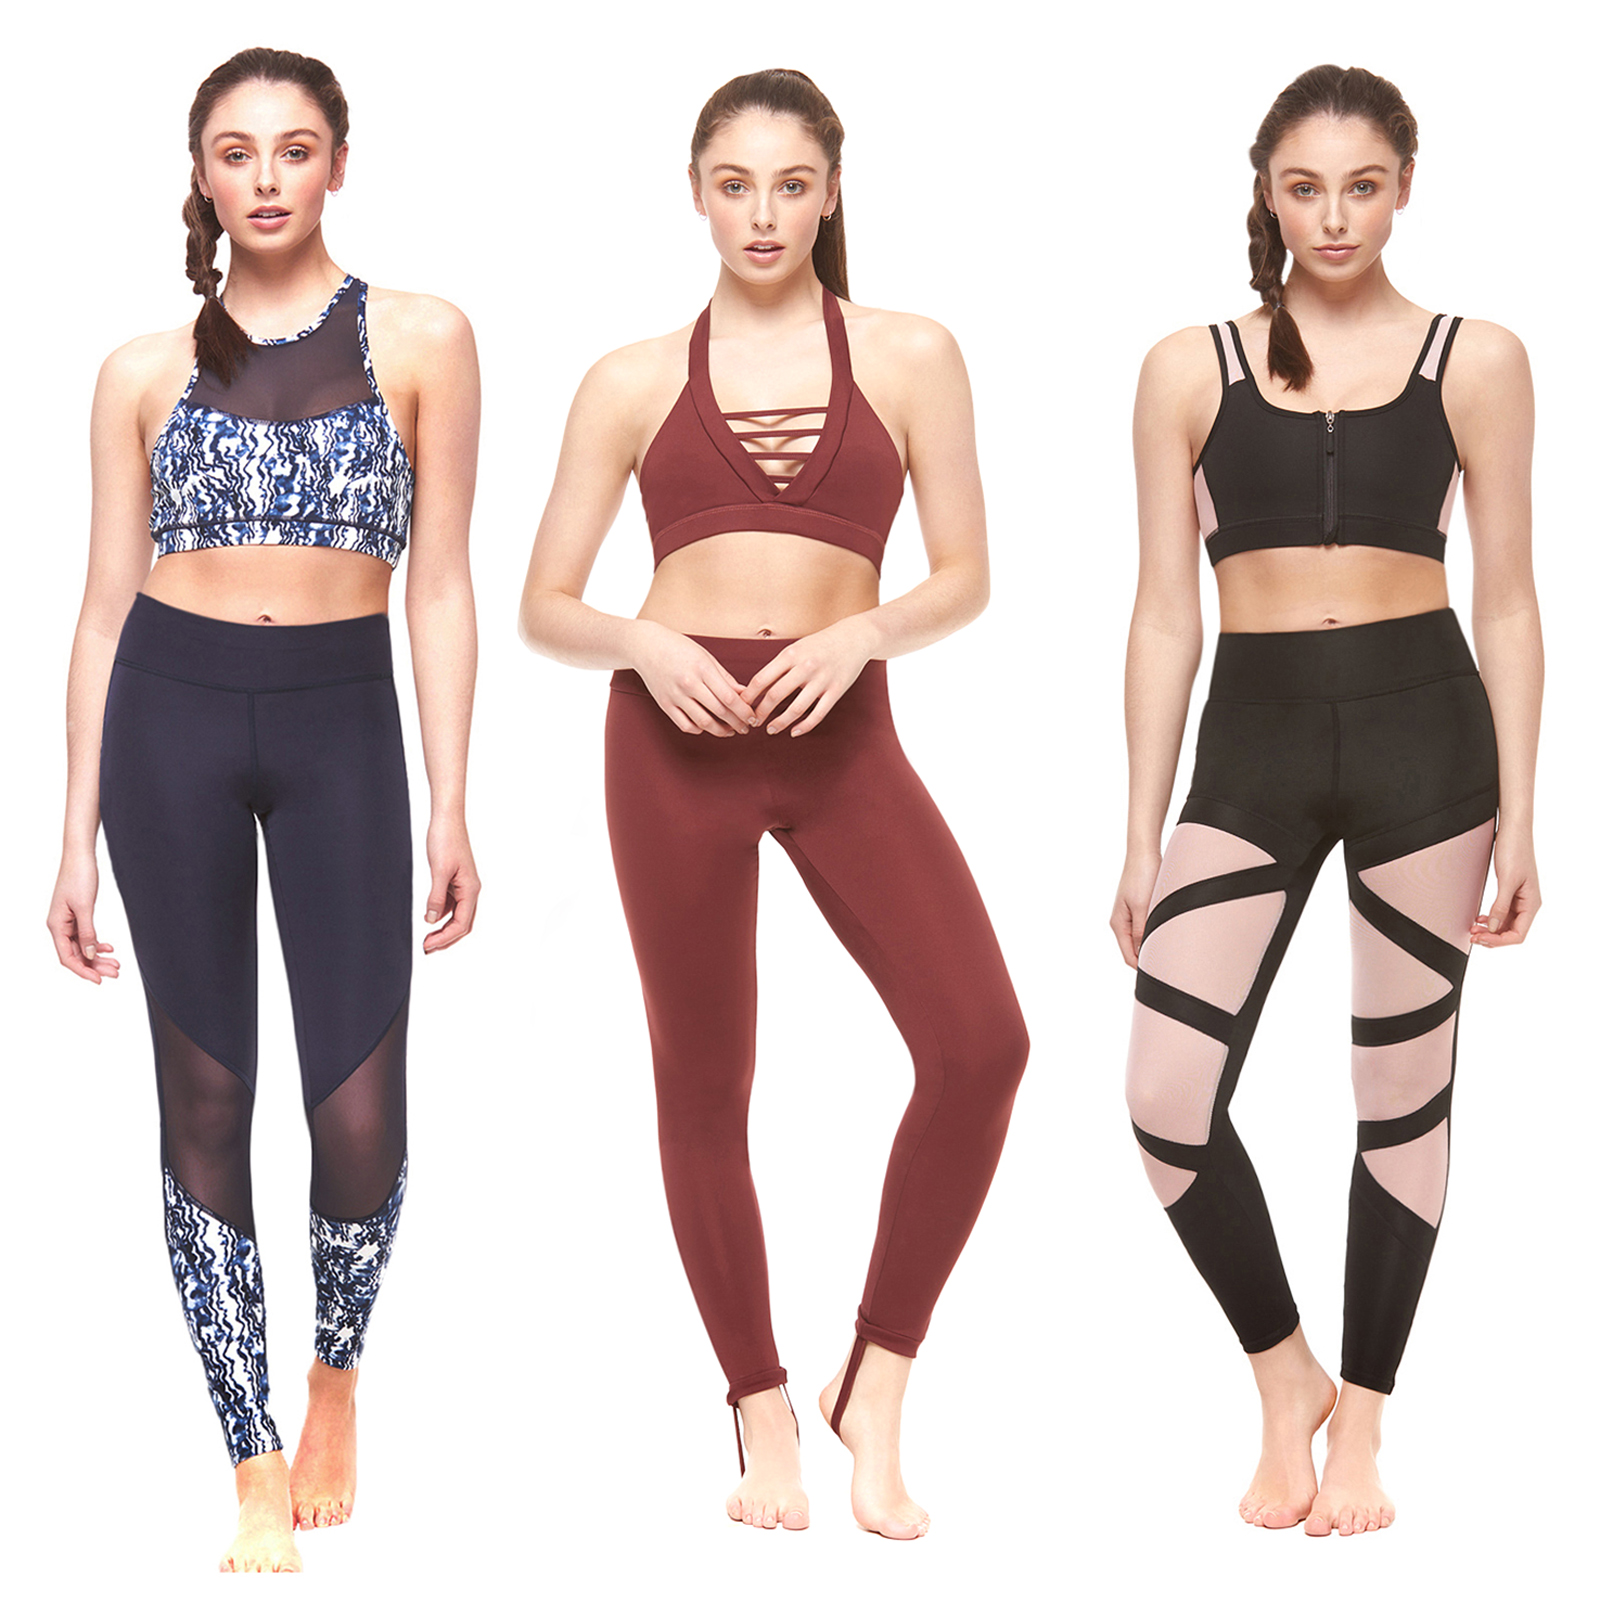 Ladies Vest Top Legging Gym Wear Set Womens Fitness Workout Yoga Sports Clothes